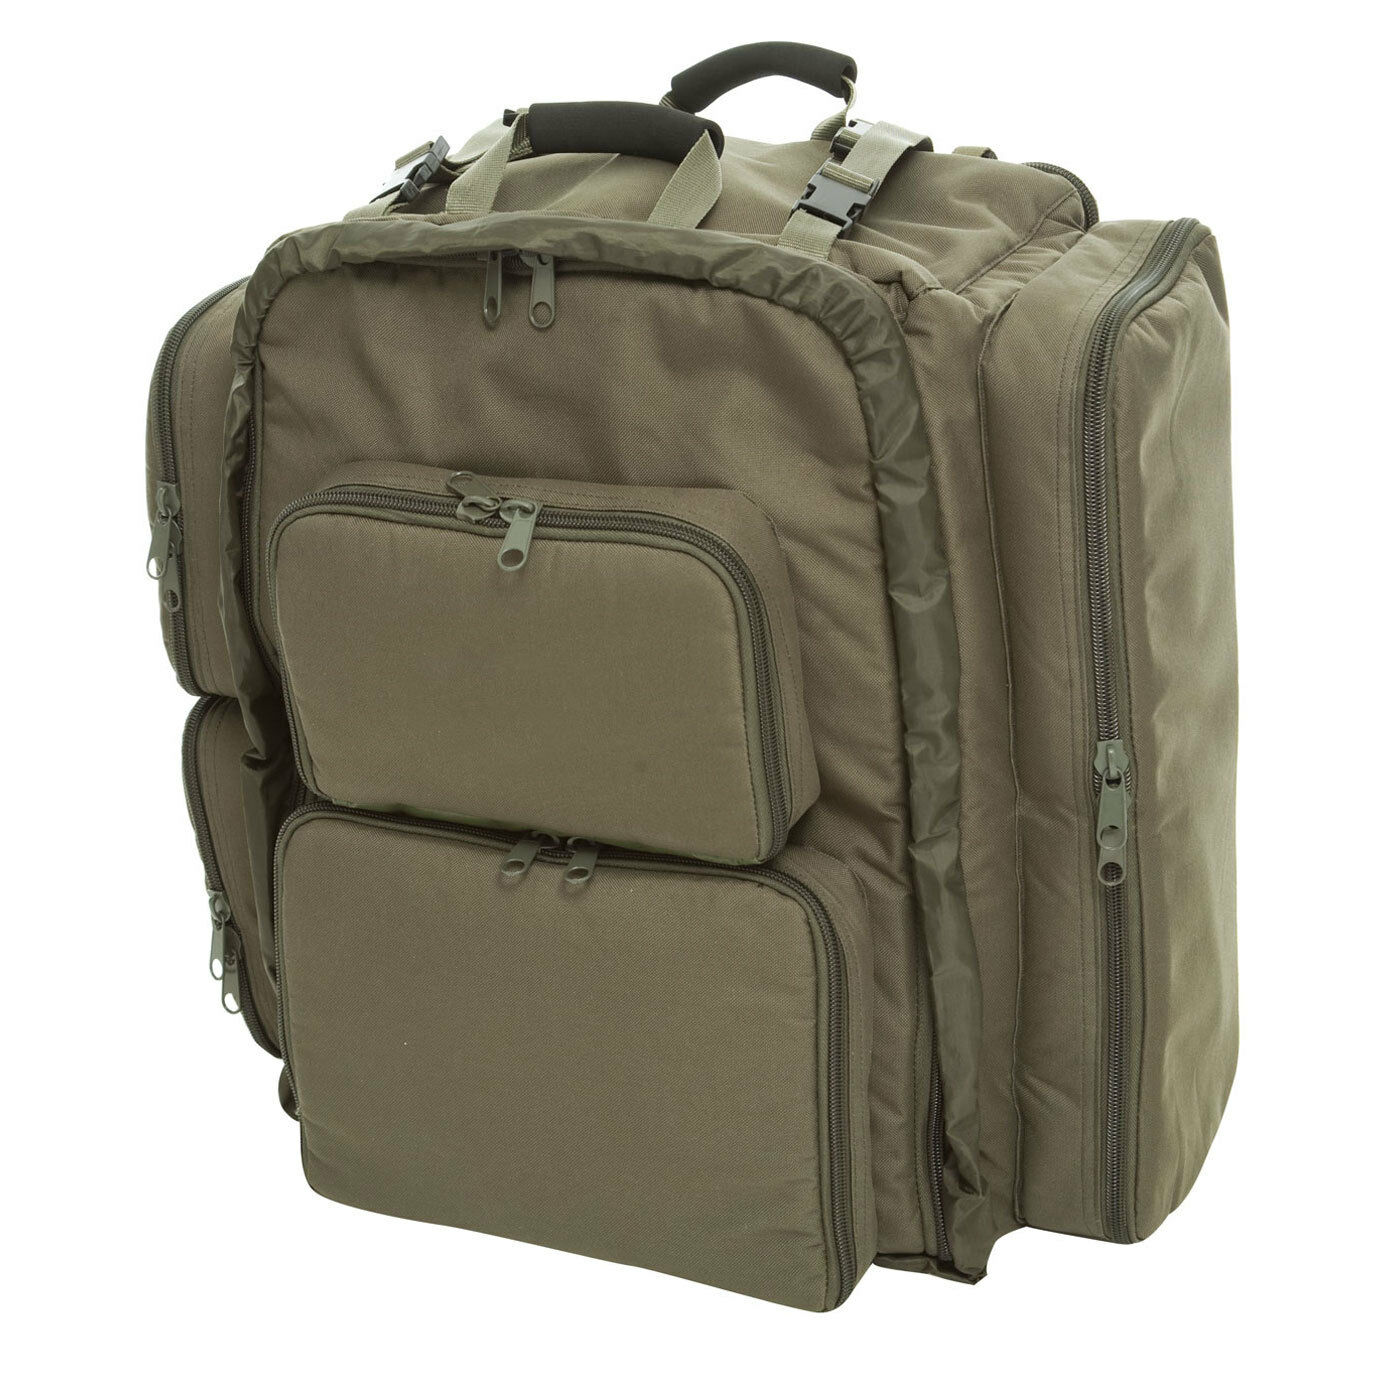 Trakker NXG 50 Litre Rucksack Brand New - Free Delivery